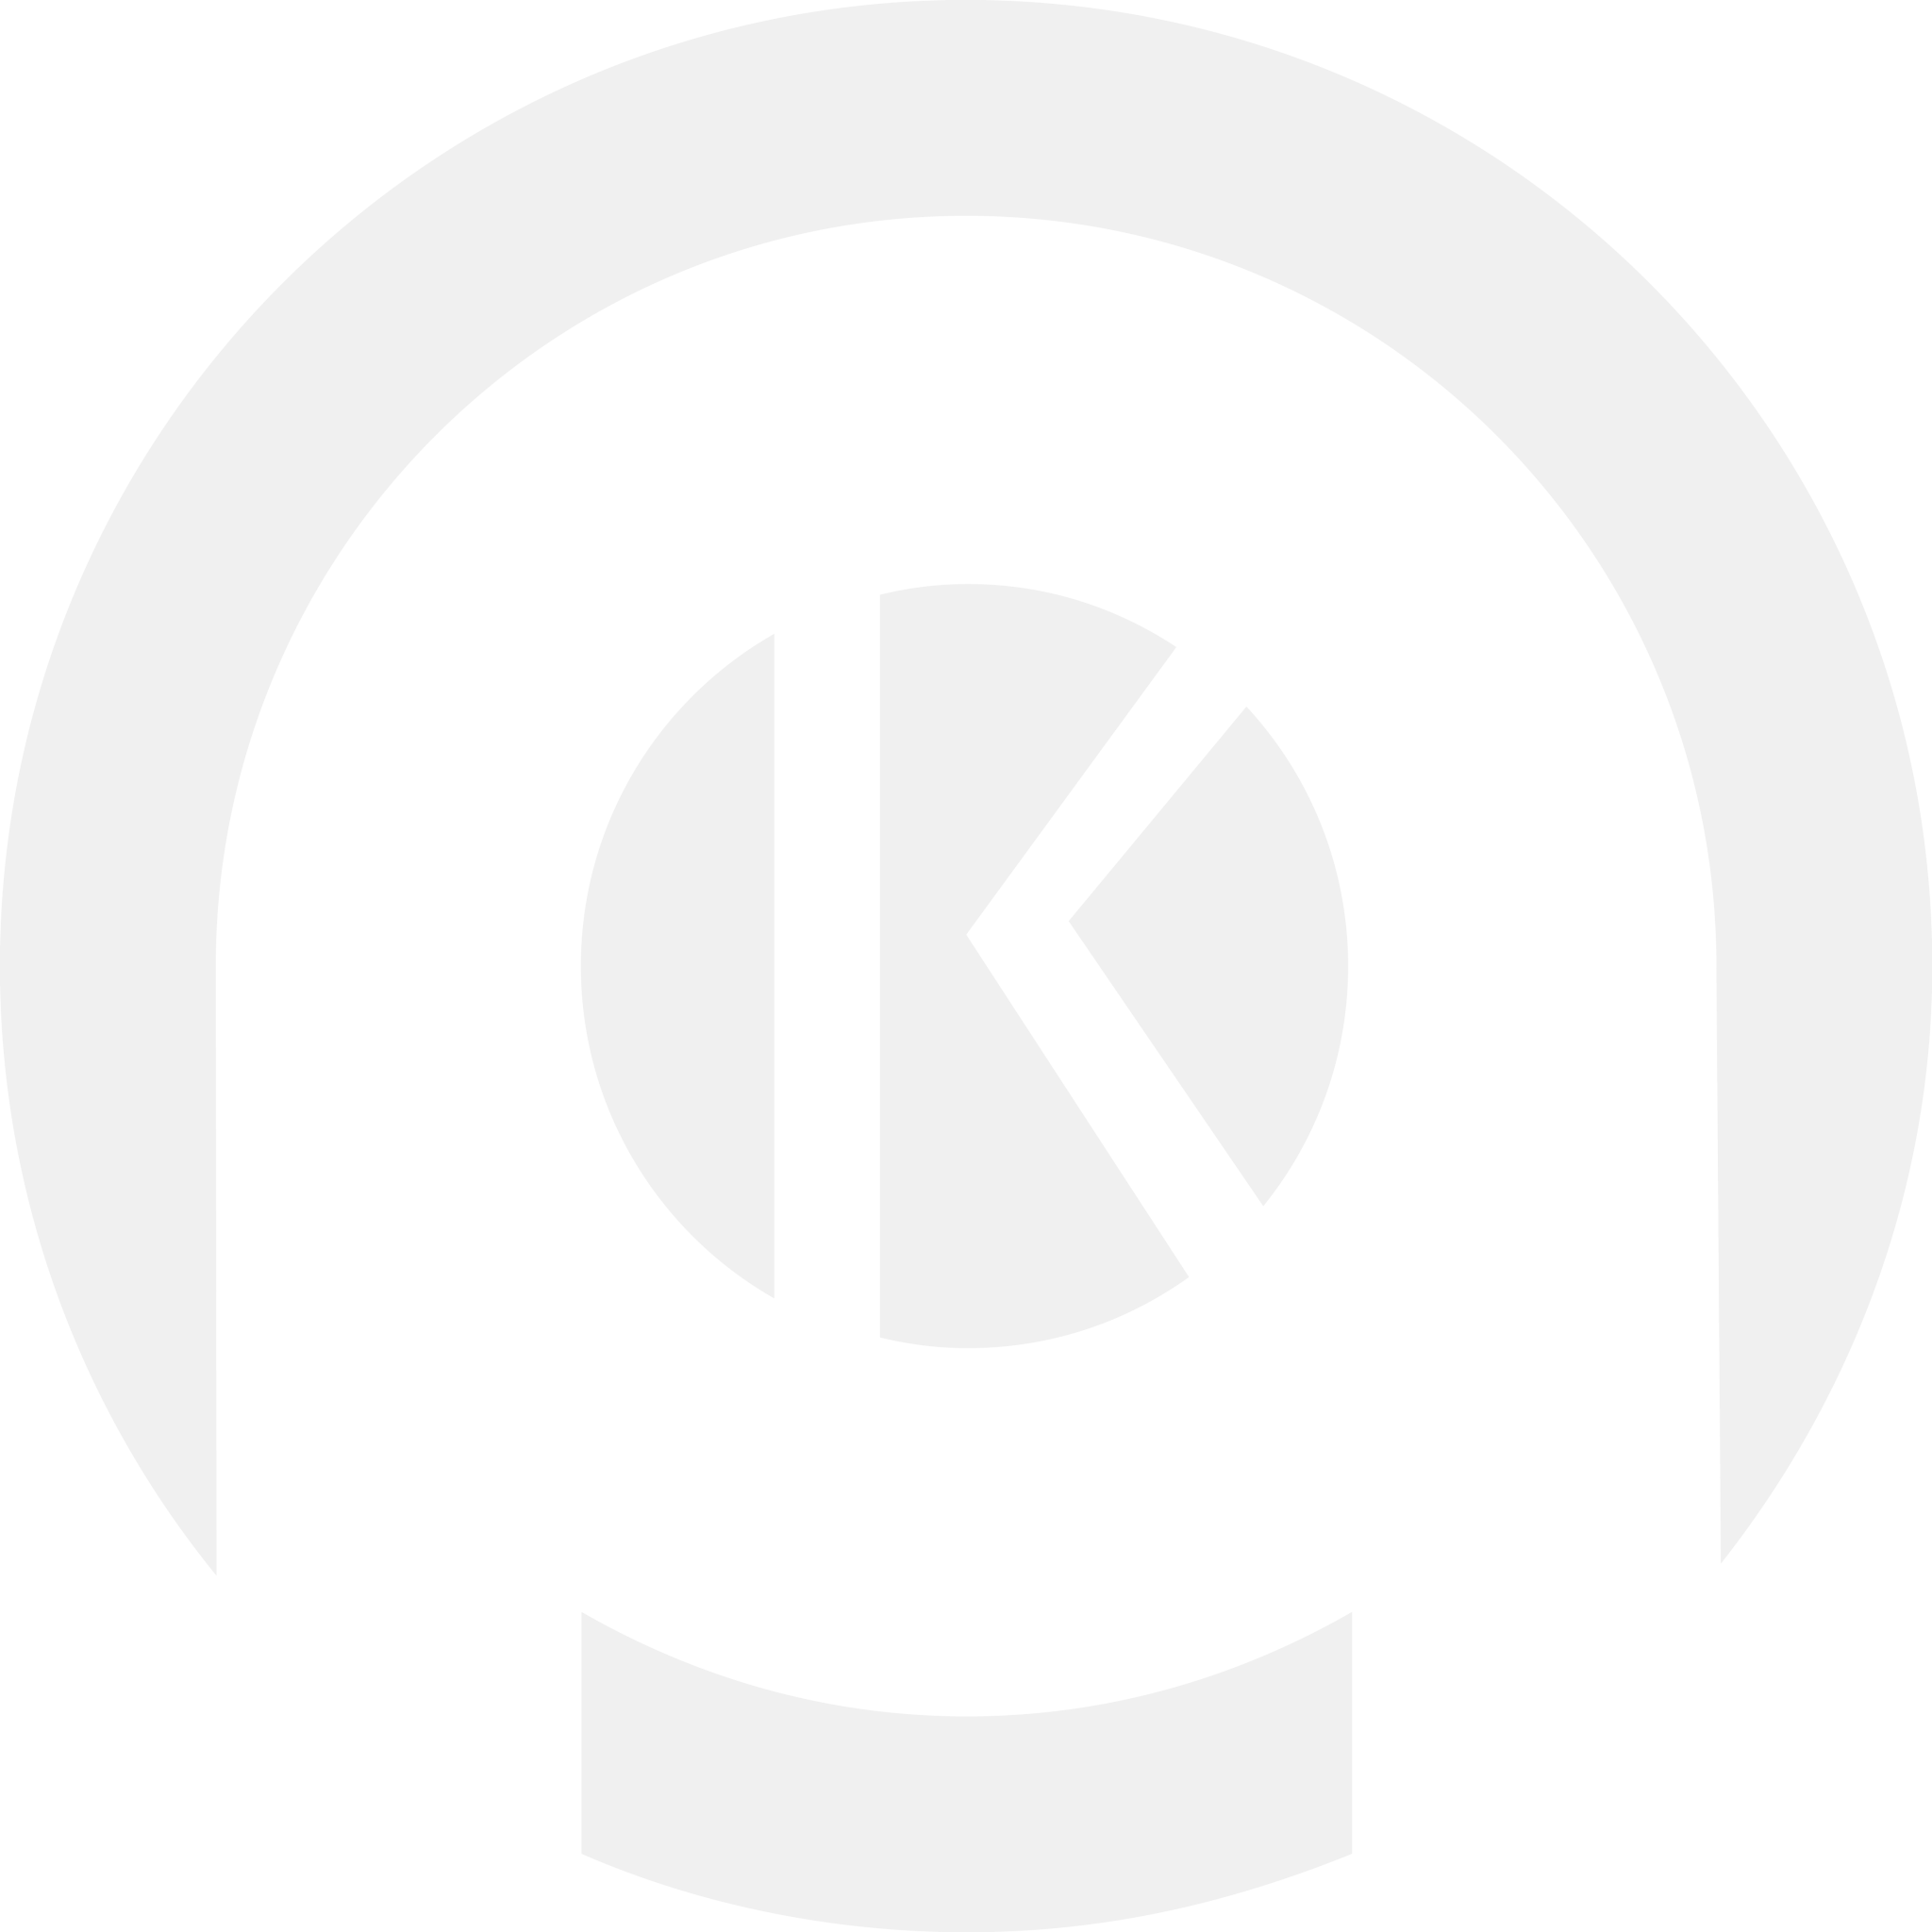 krush logo white